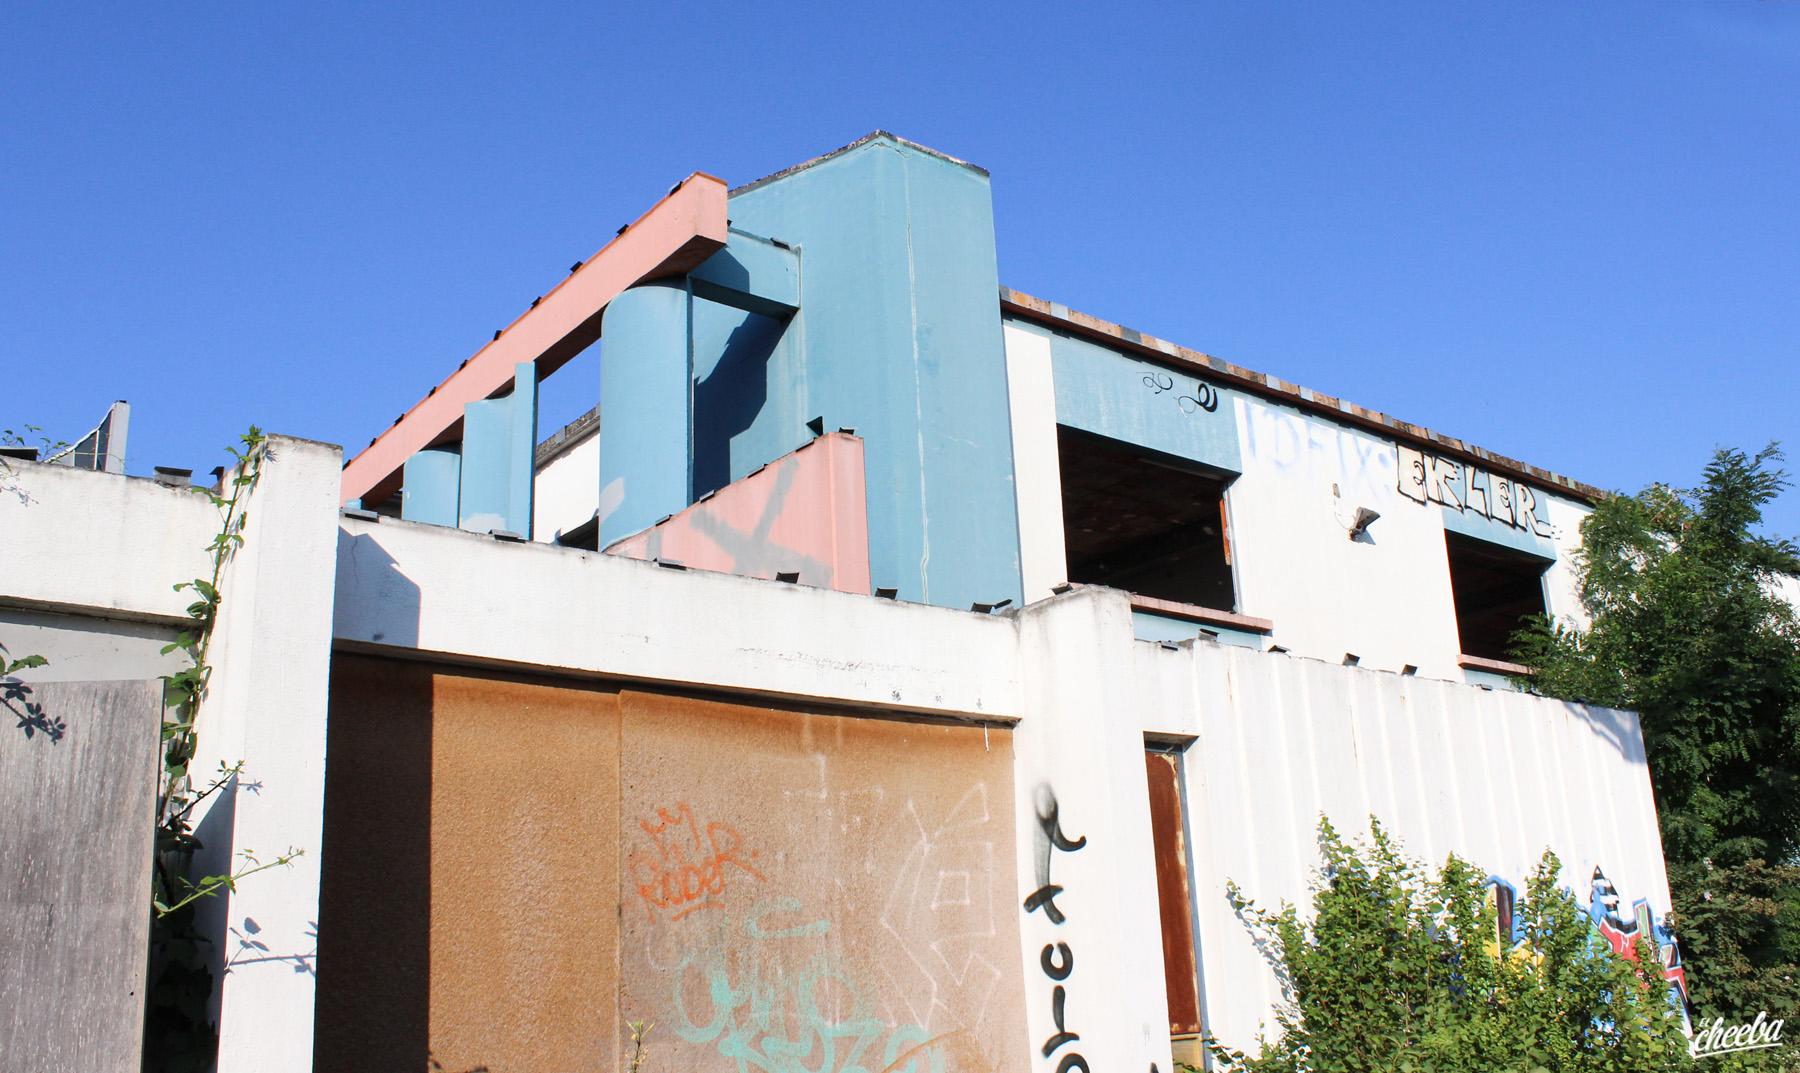 Urbex à l'Usine Austin Powers, usine abandonnée à Strasbourg - Urbex Alsace